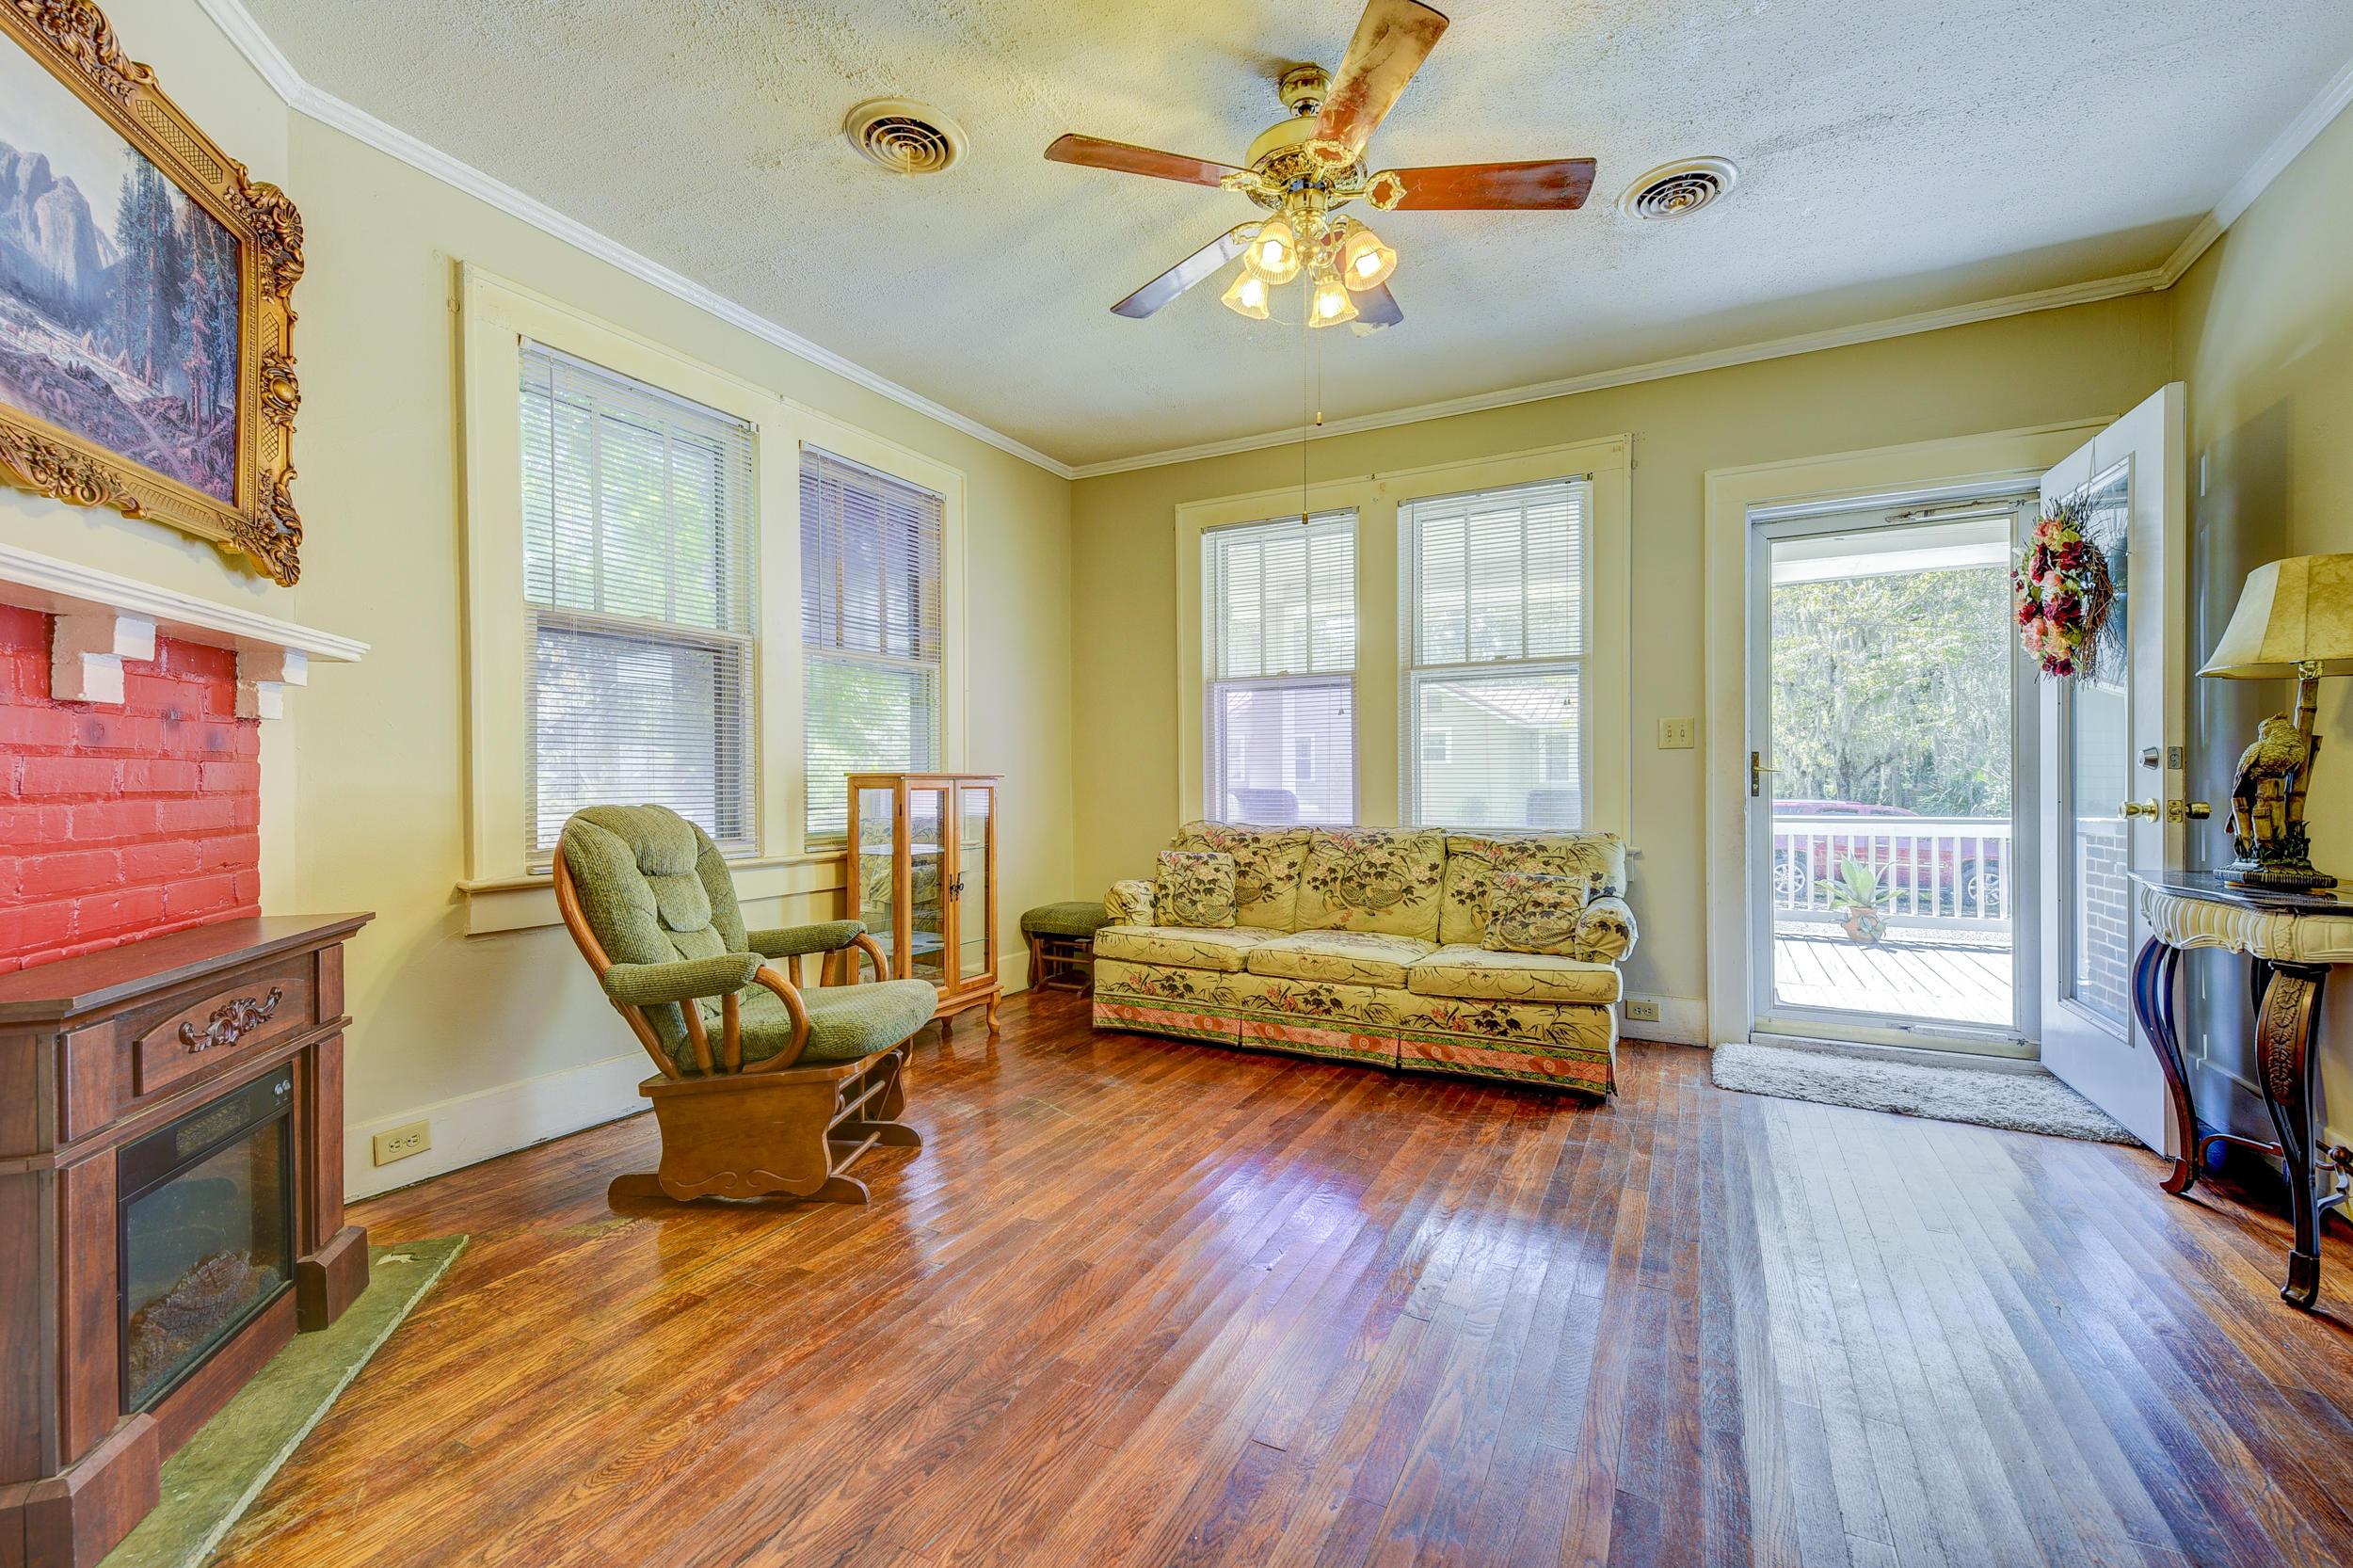 St Andrews Homes For Sale - 1908 2nd, Charleston, SC - 19